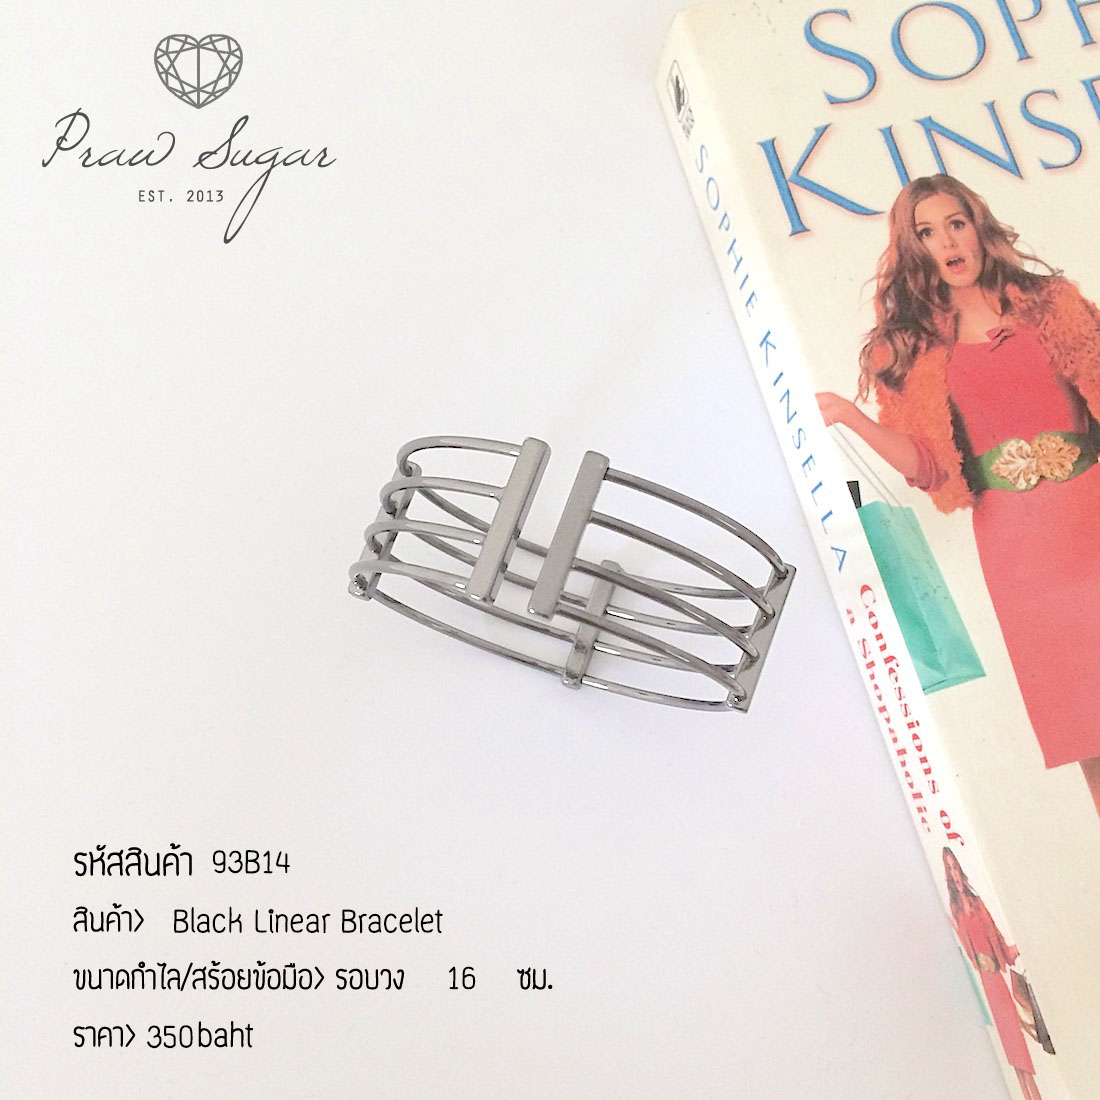 Black Linear Bracelet